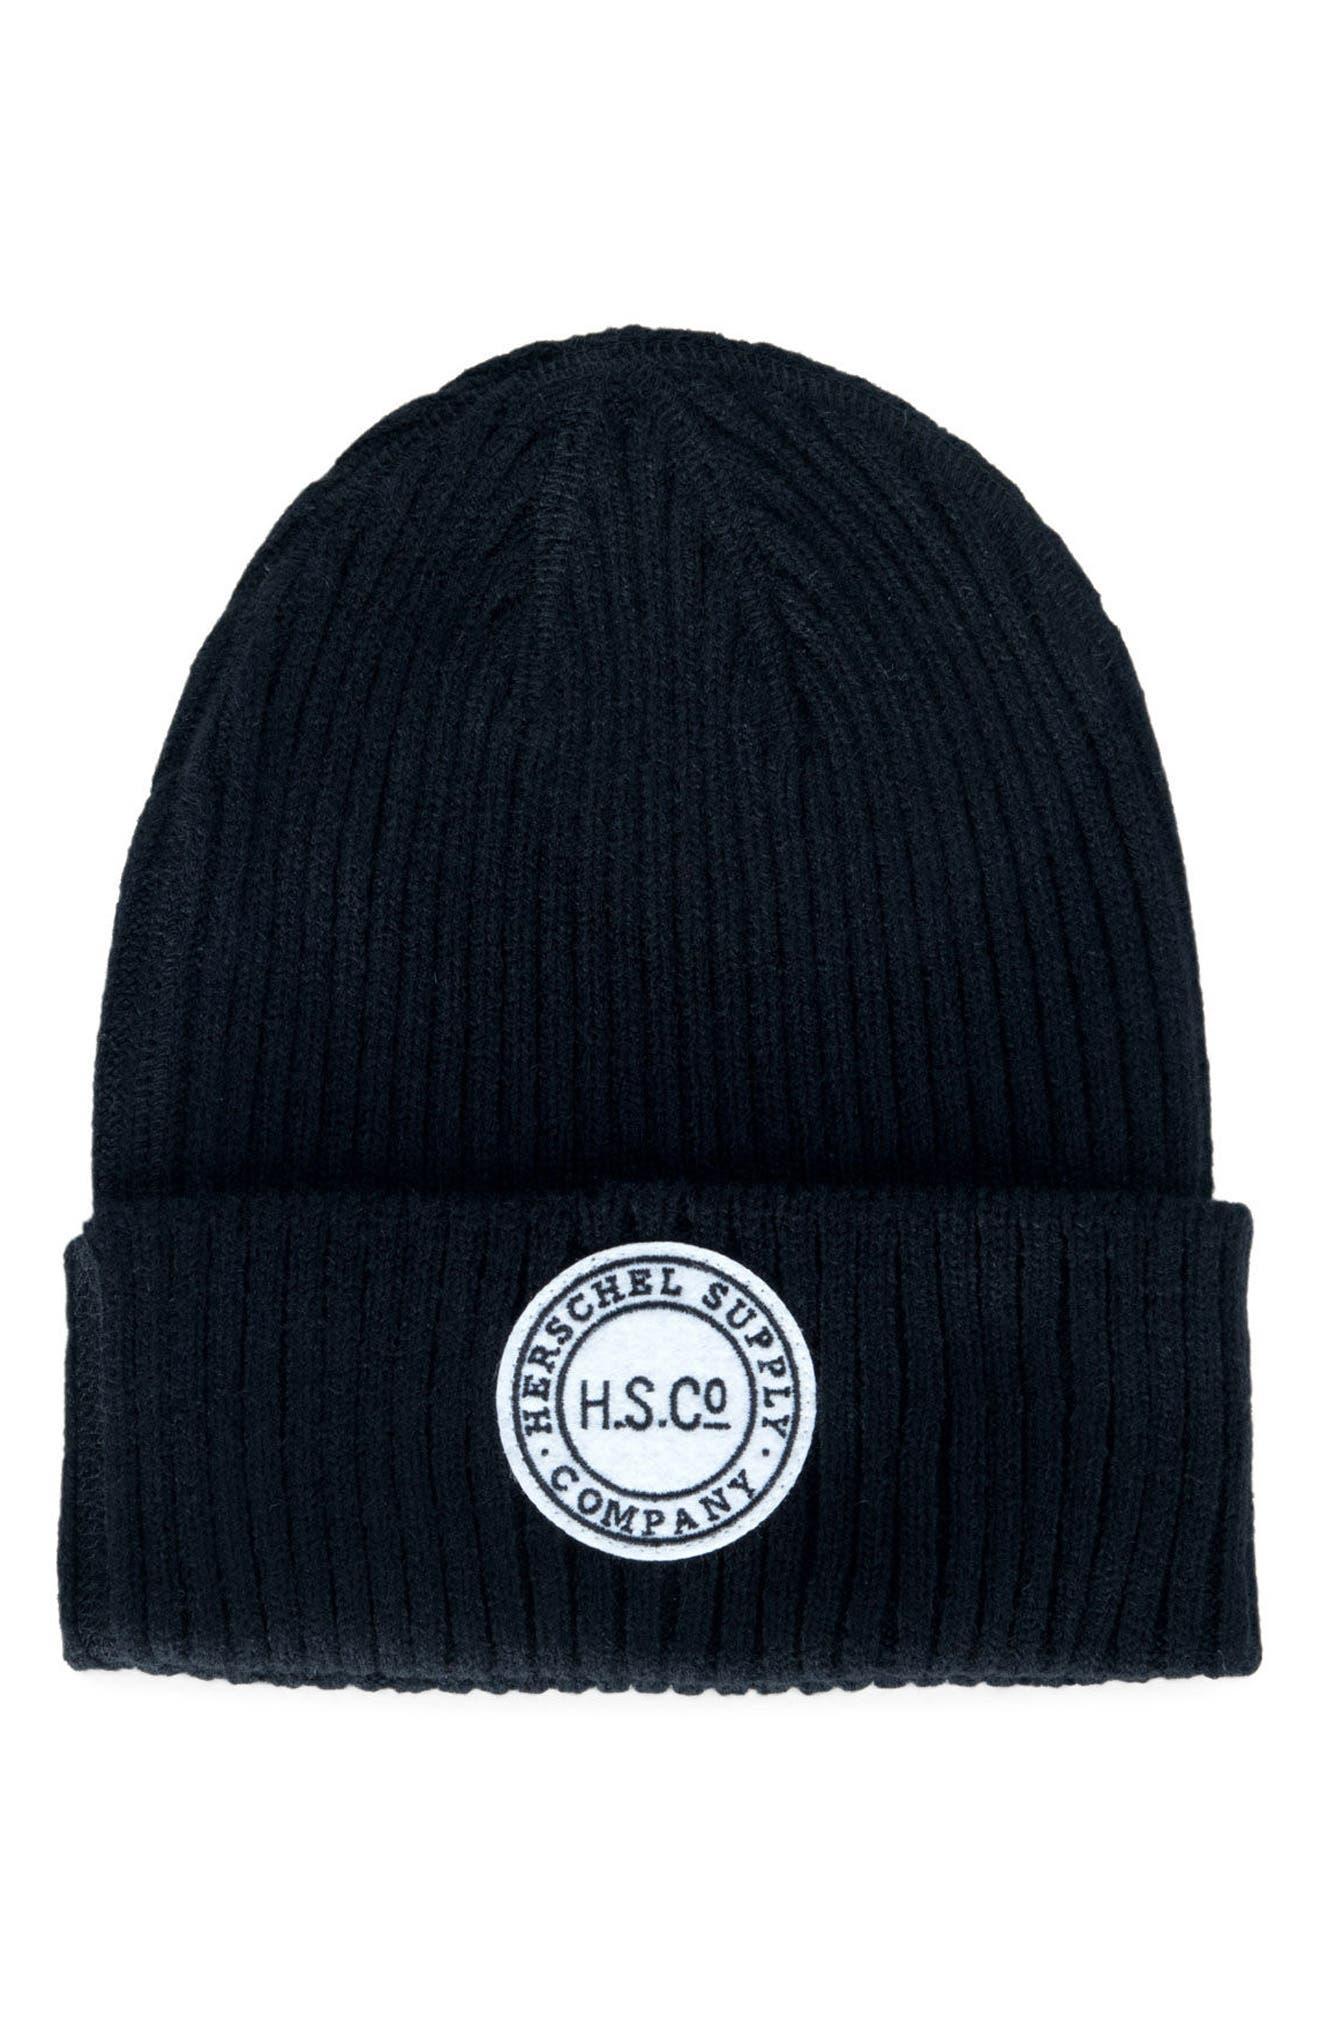 Herschel Supply Co. Aloft Rib Knit Cap